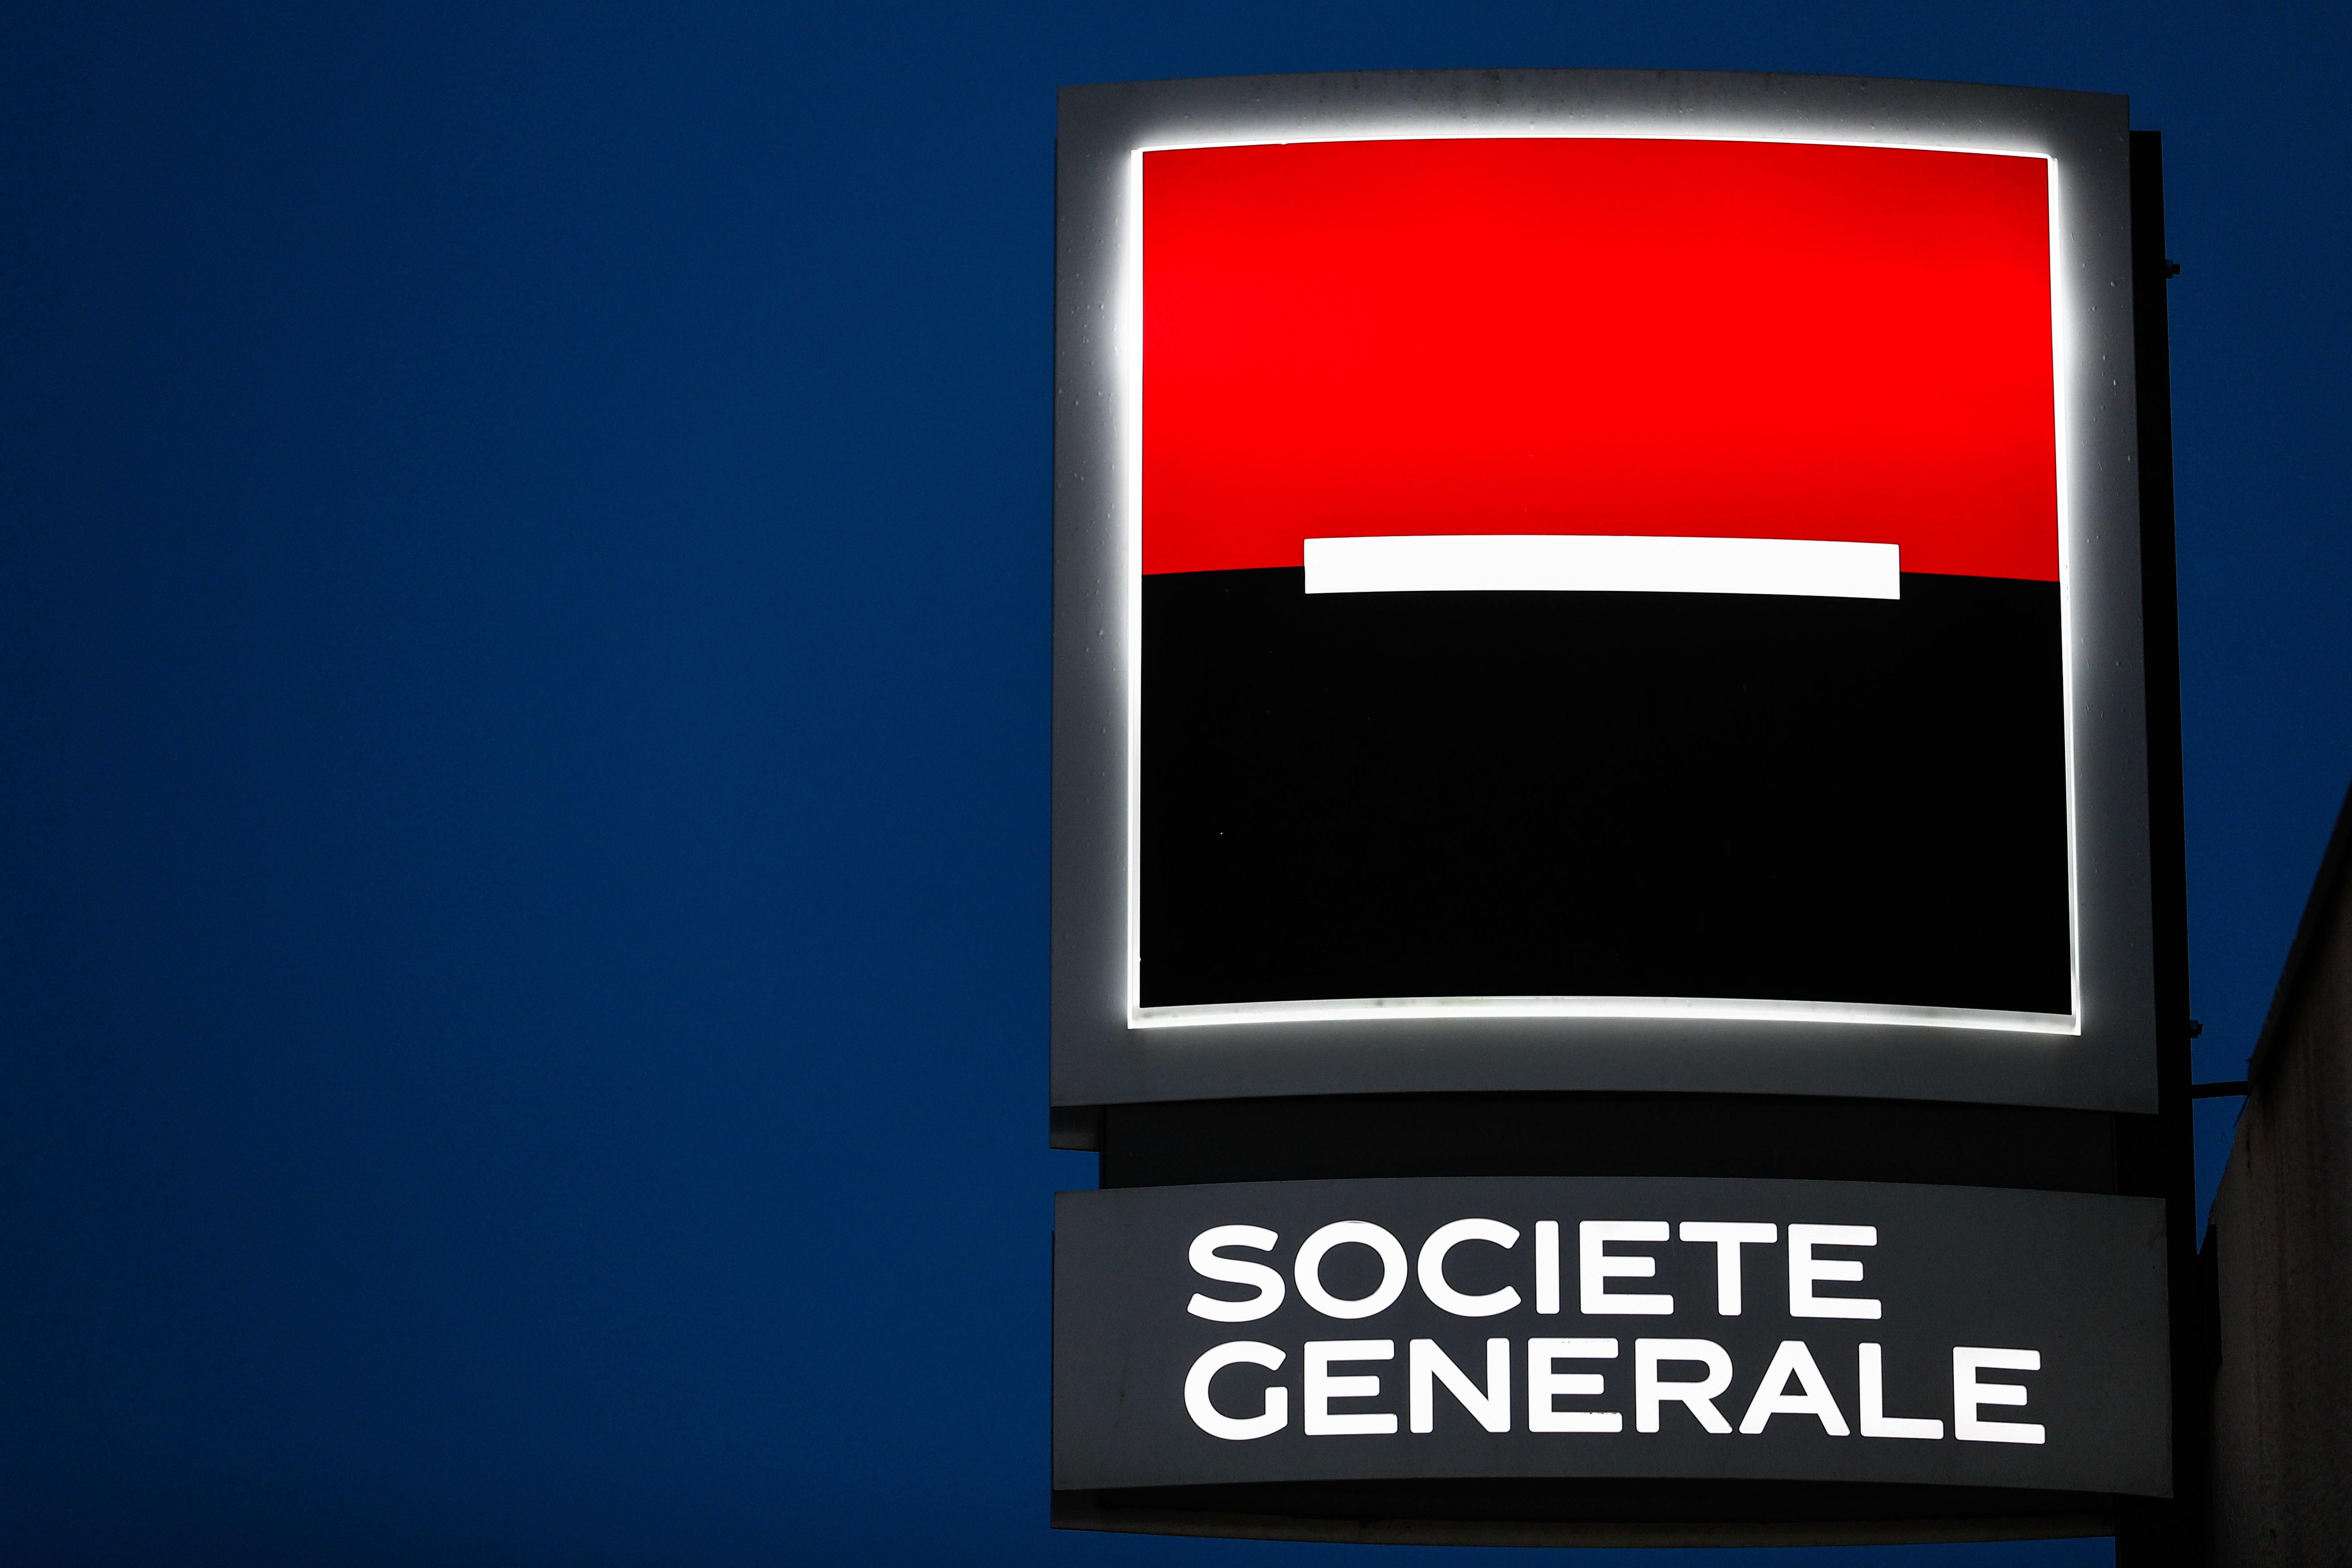 SocGen posts profit beat in fourth quarter despite dip in trading revenue - CNBC